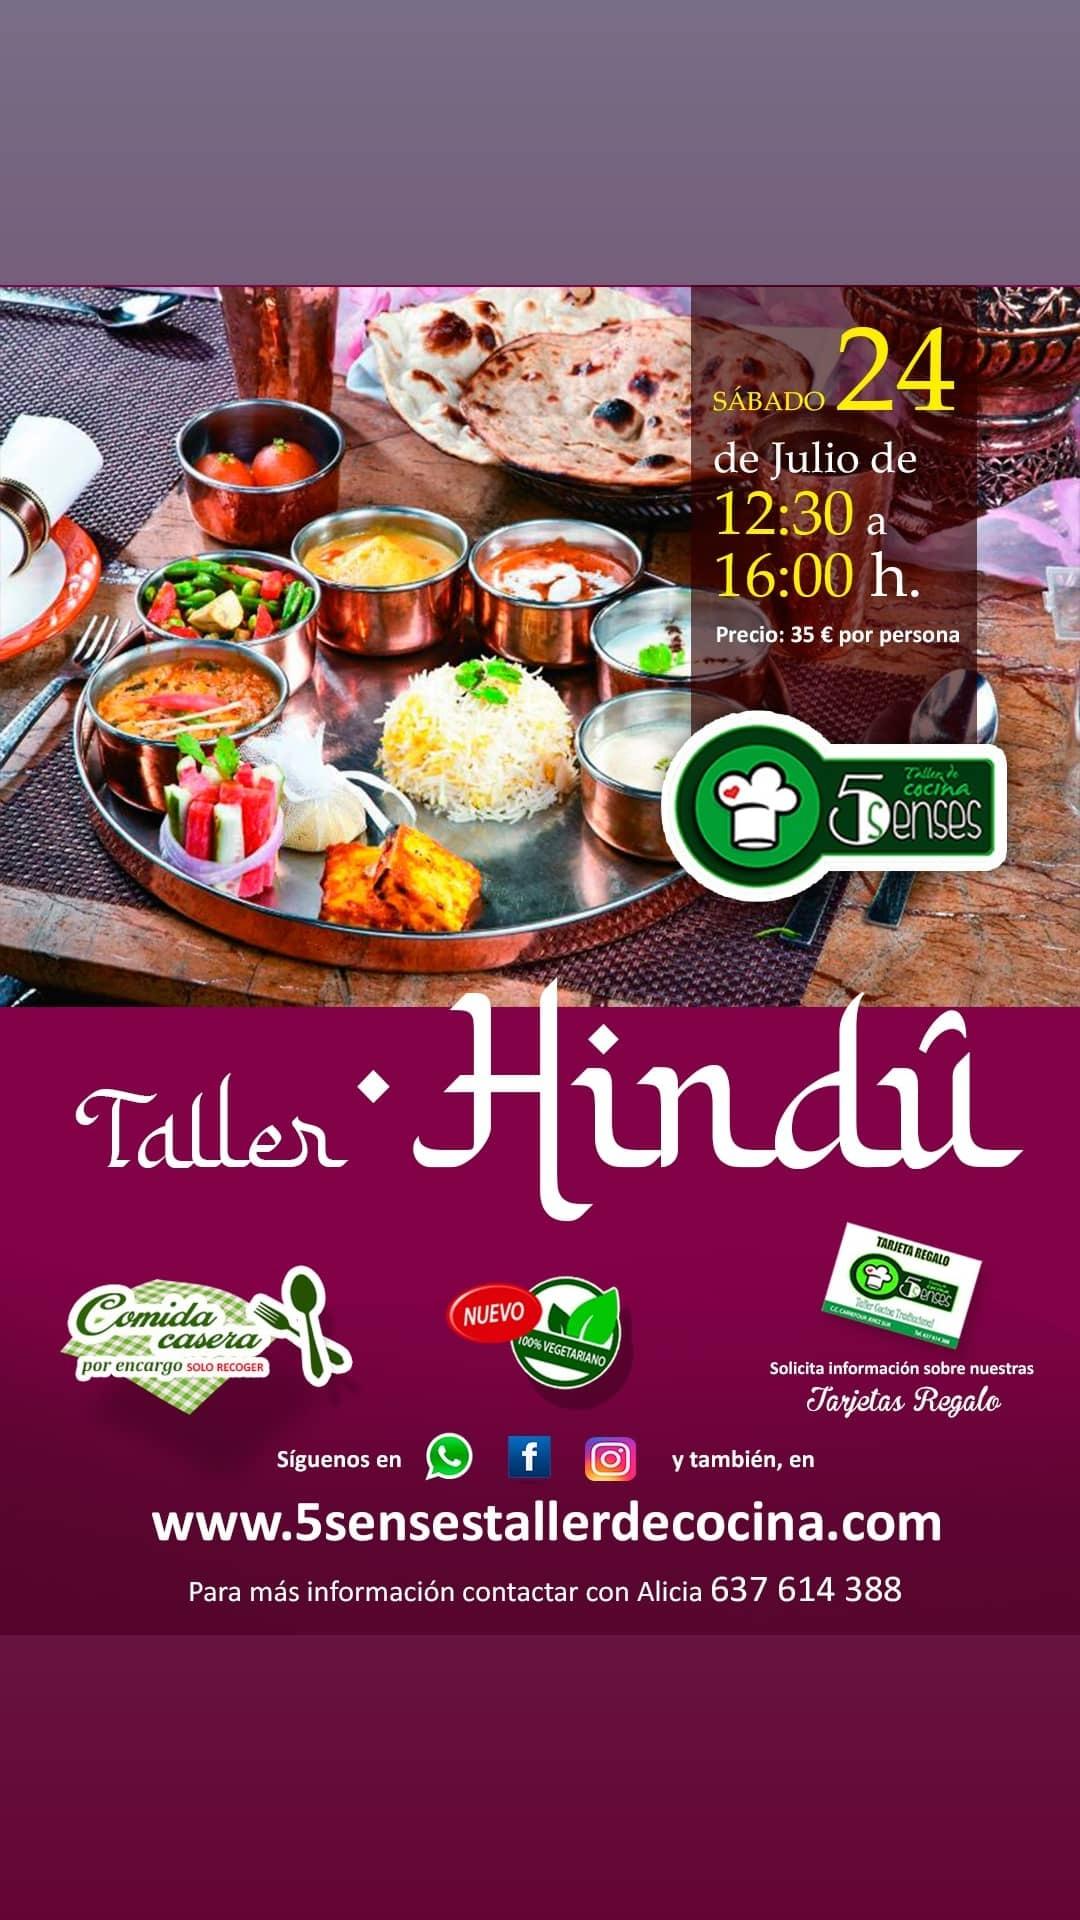 TALLER HINDU